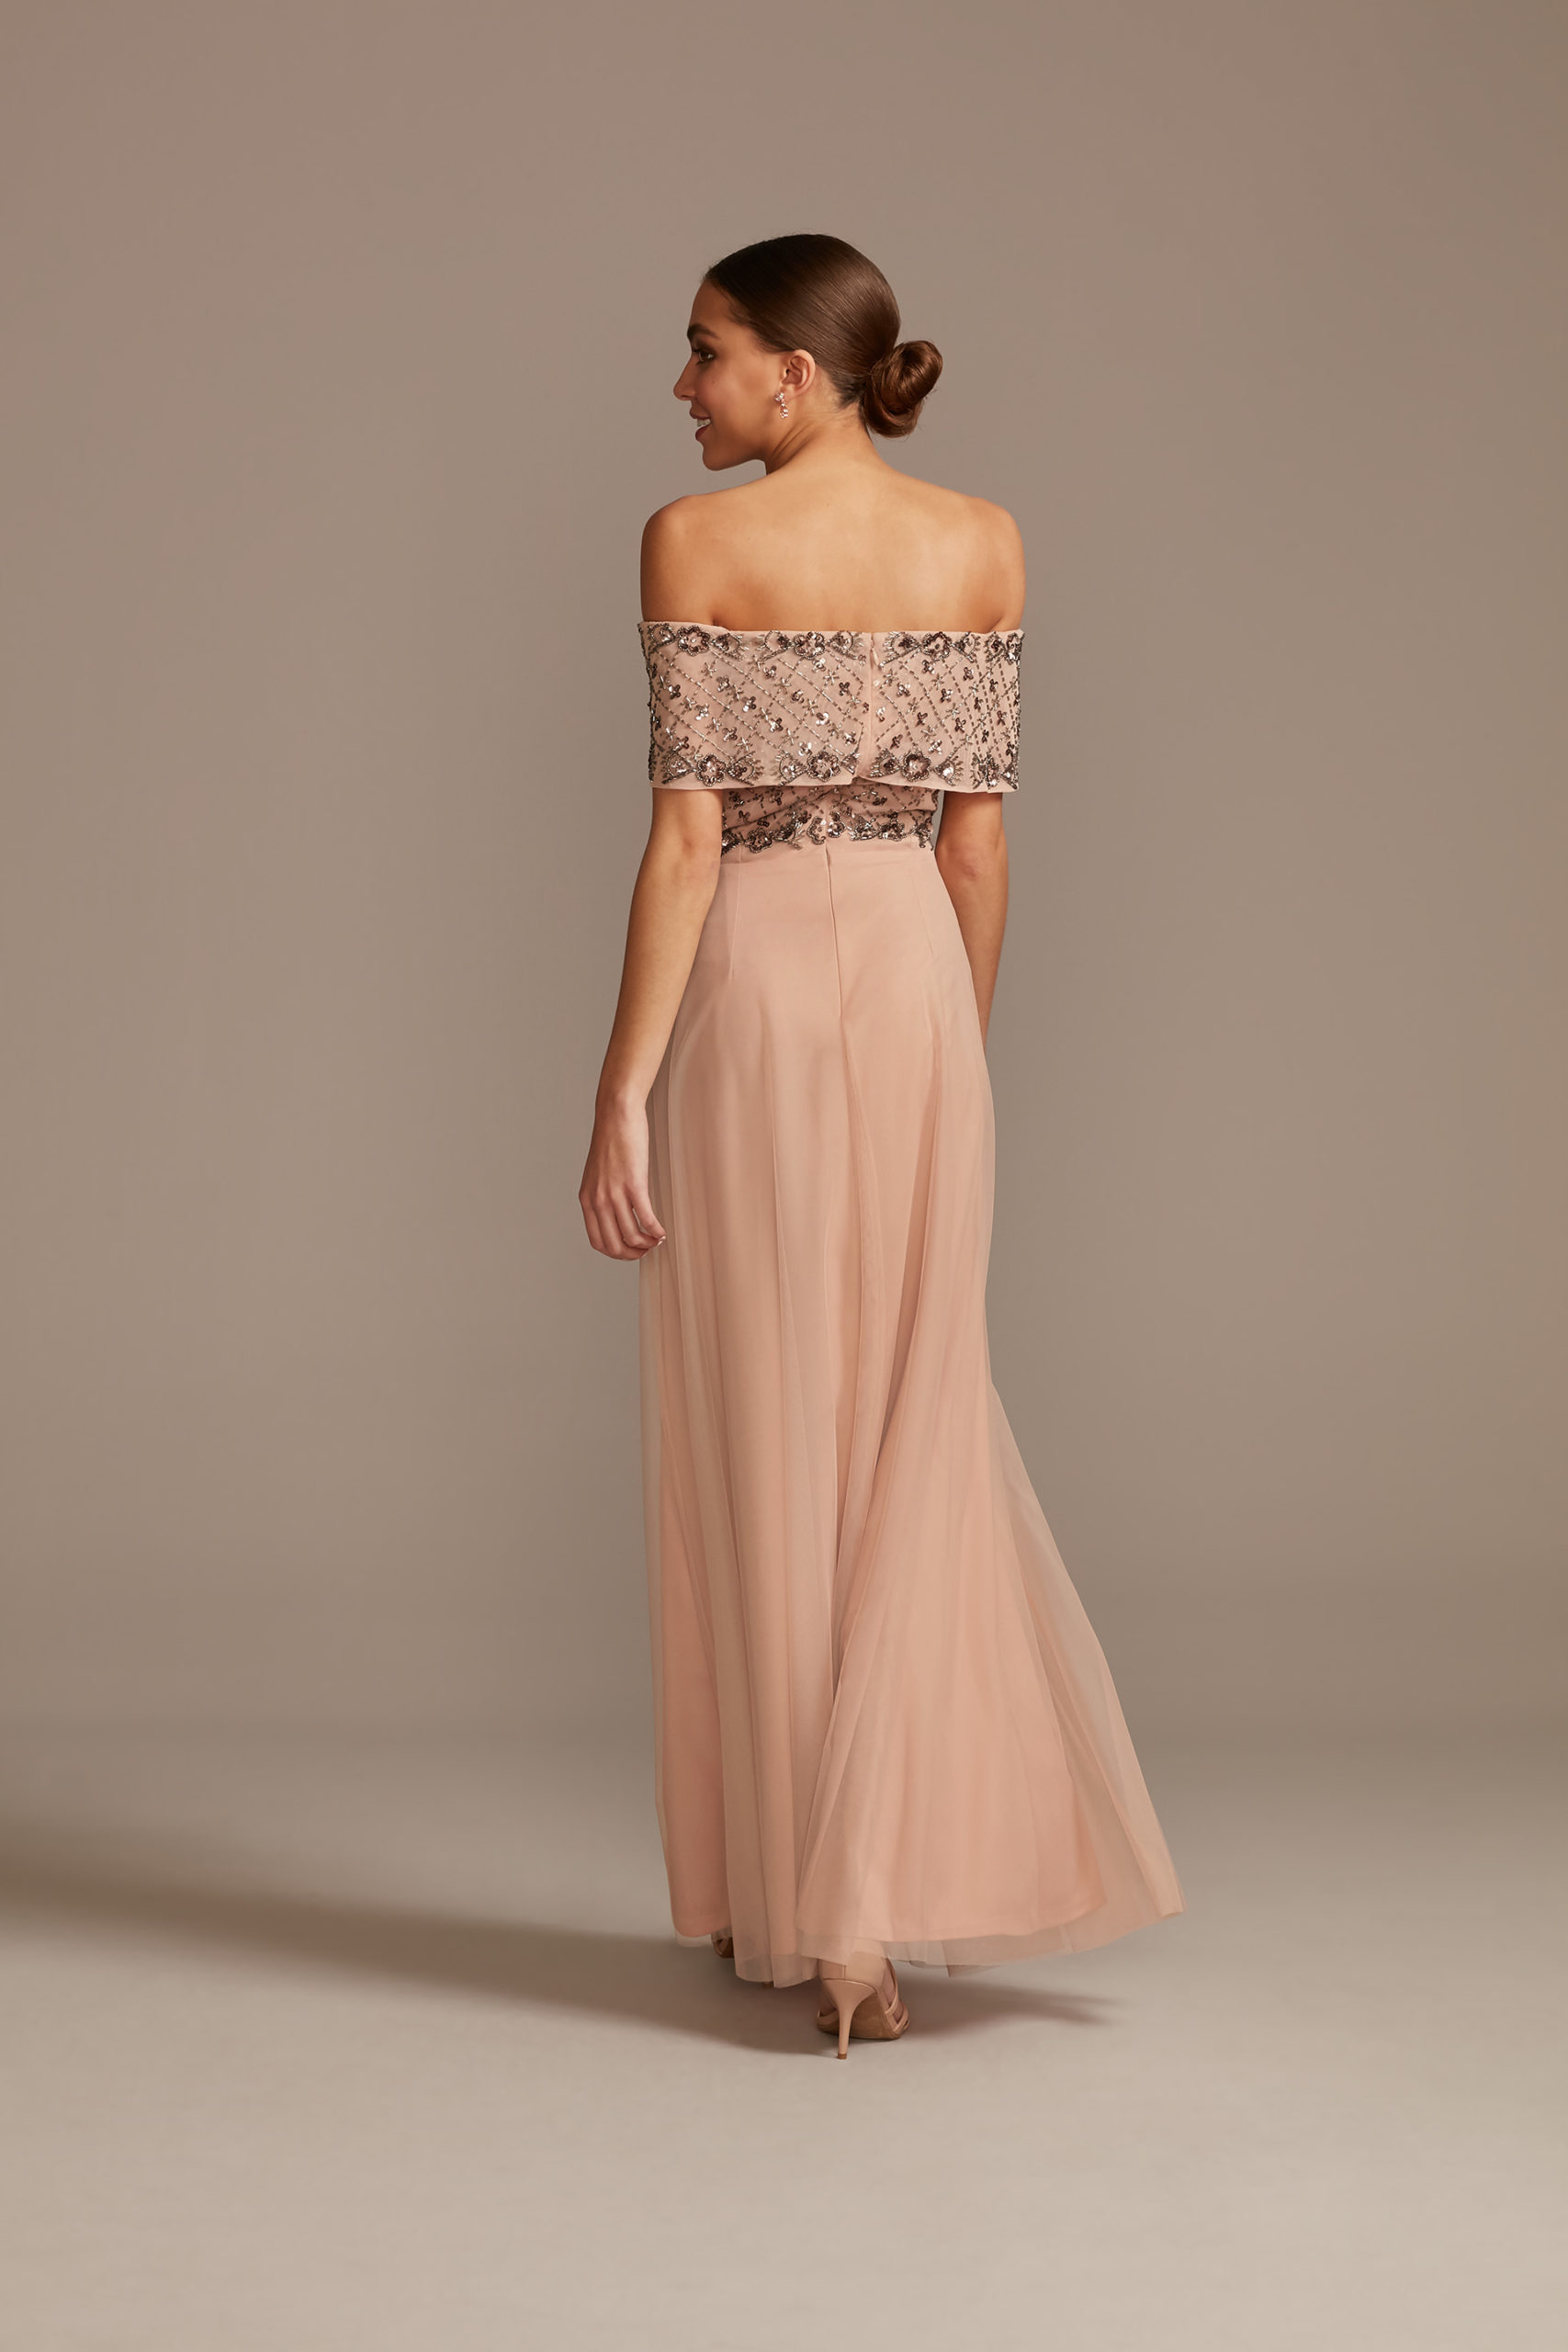 Pink off the shoulder mother of the bride dress